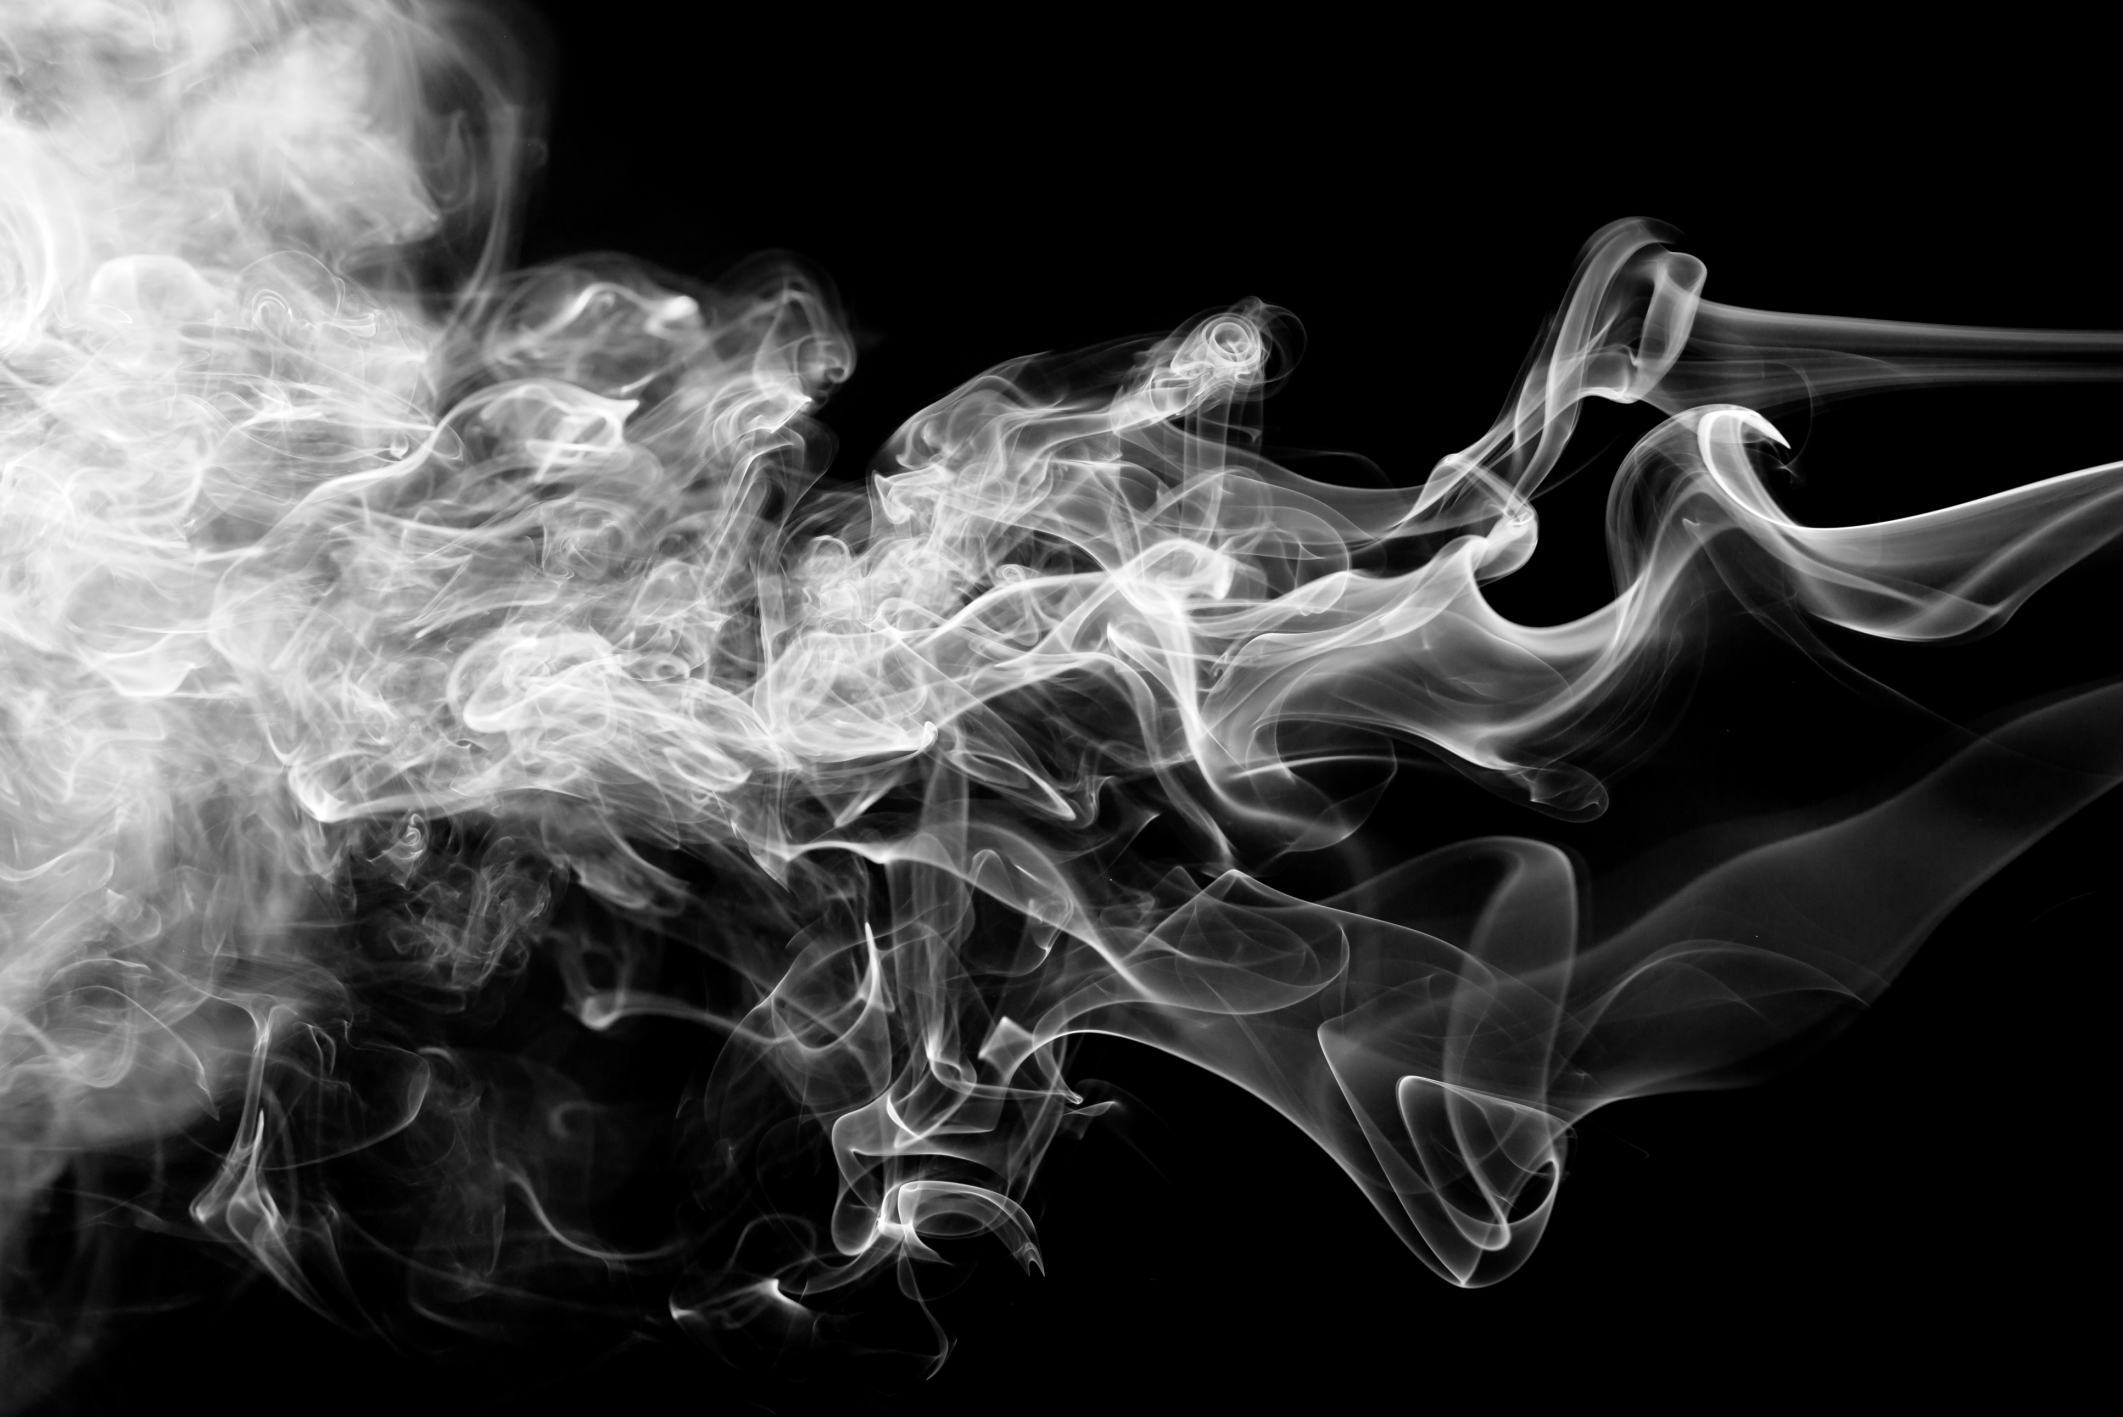 High Resolution Wallpaper | Smoke 2123x1417 px